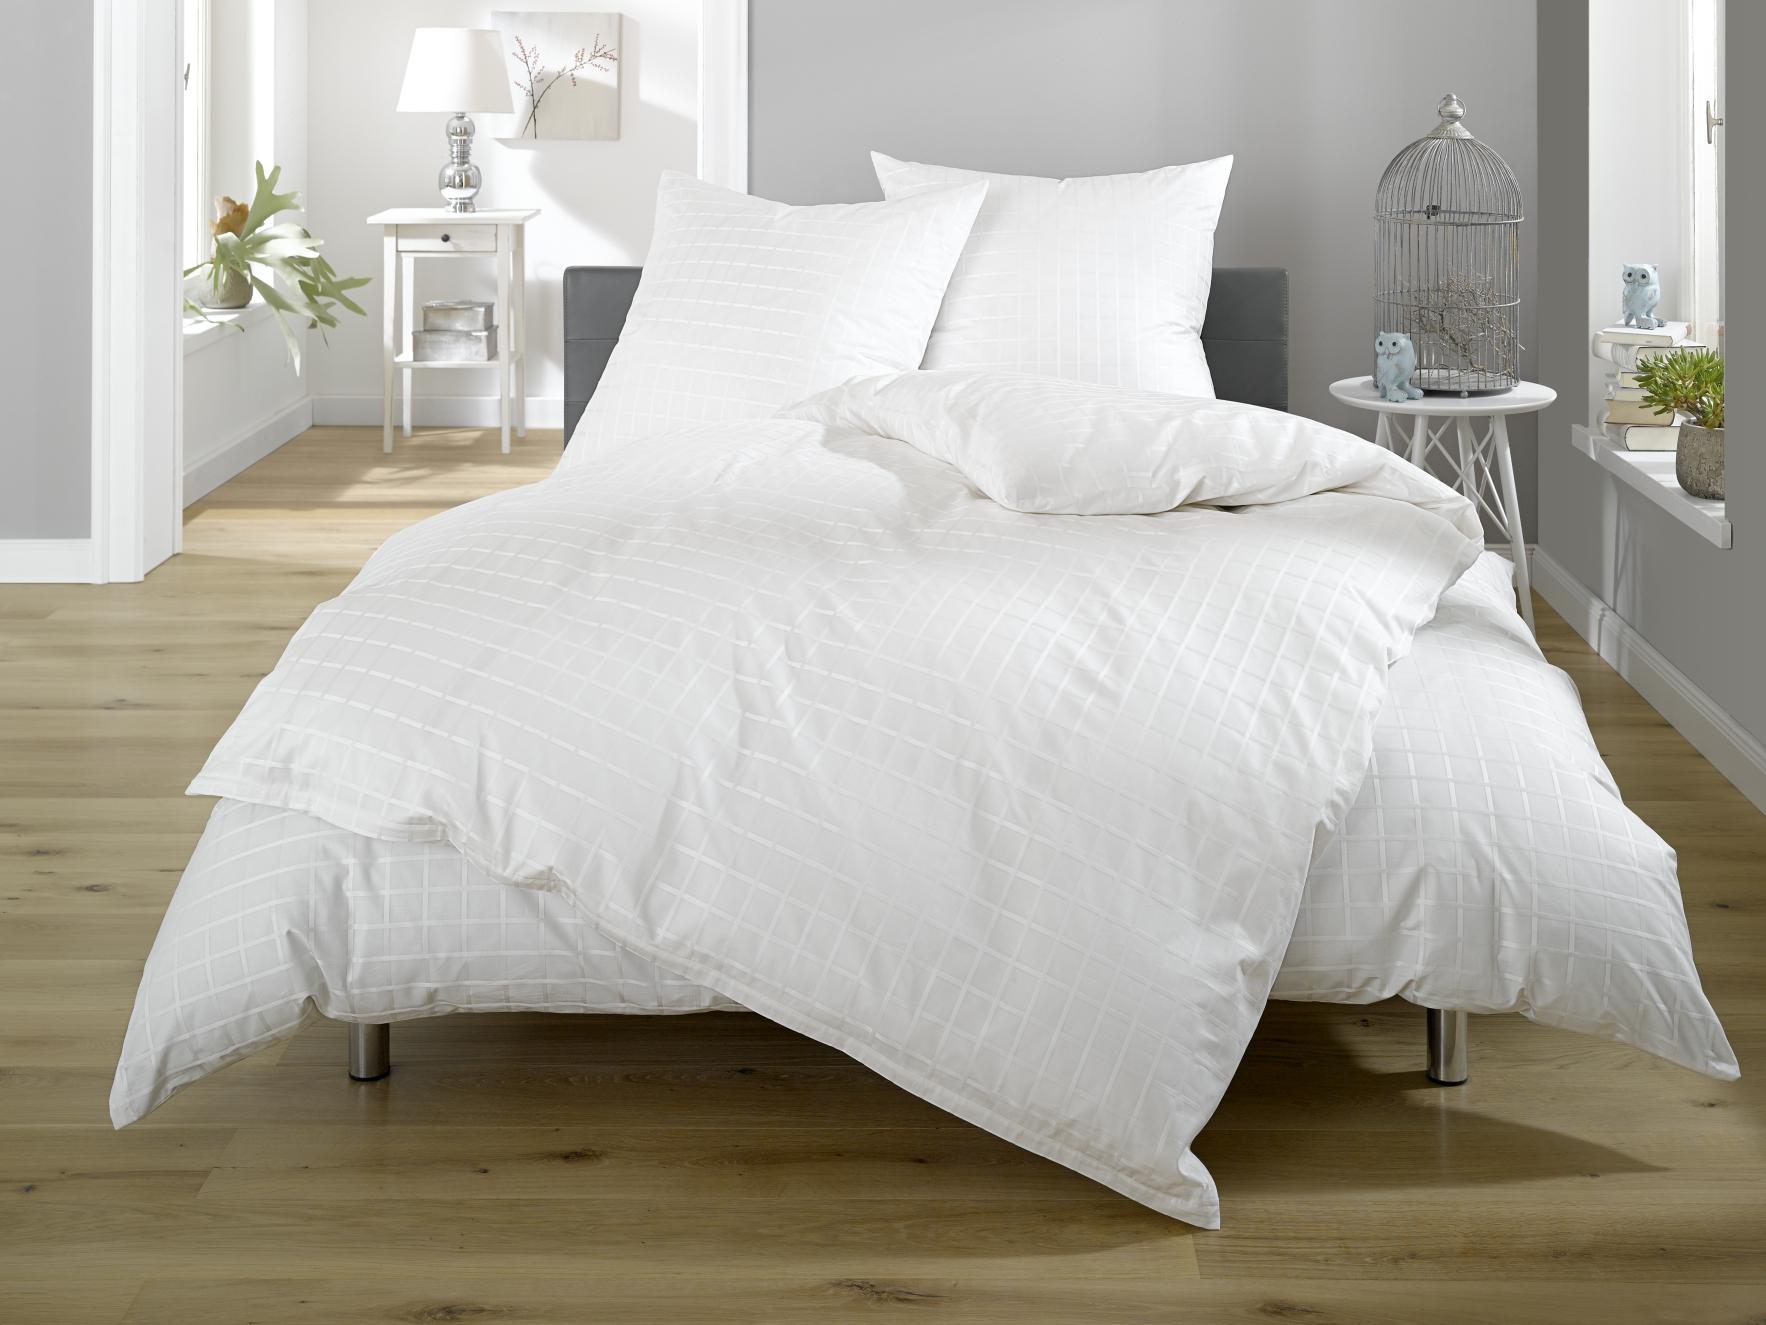 bettdecken selber gestalten bettw sche stoffe meterware. Black Bedroom Furniture Sets. Home Design Ideas